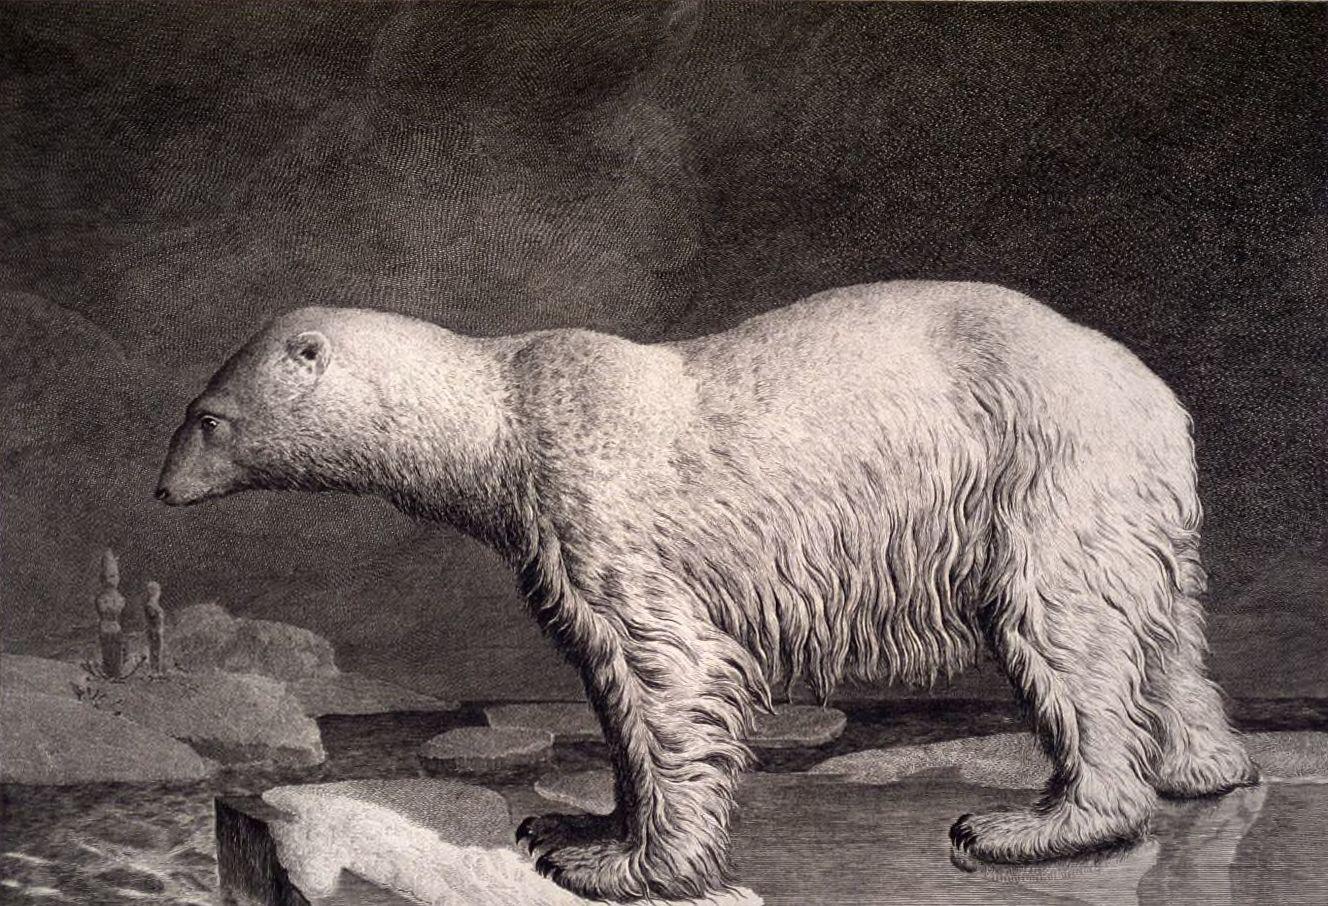 File:Dessin ursus maritimus ours polaire grand.jpg - Wikimedia Commons